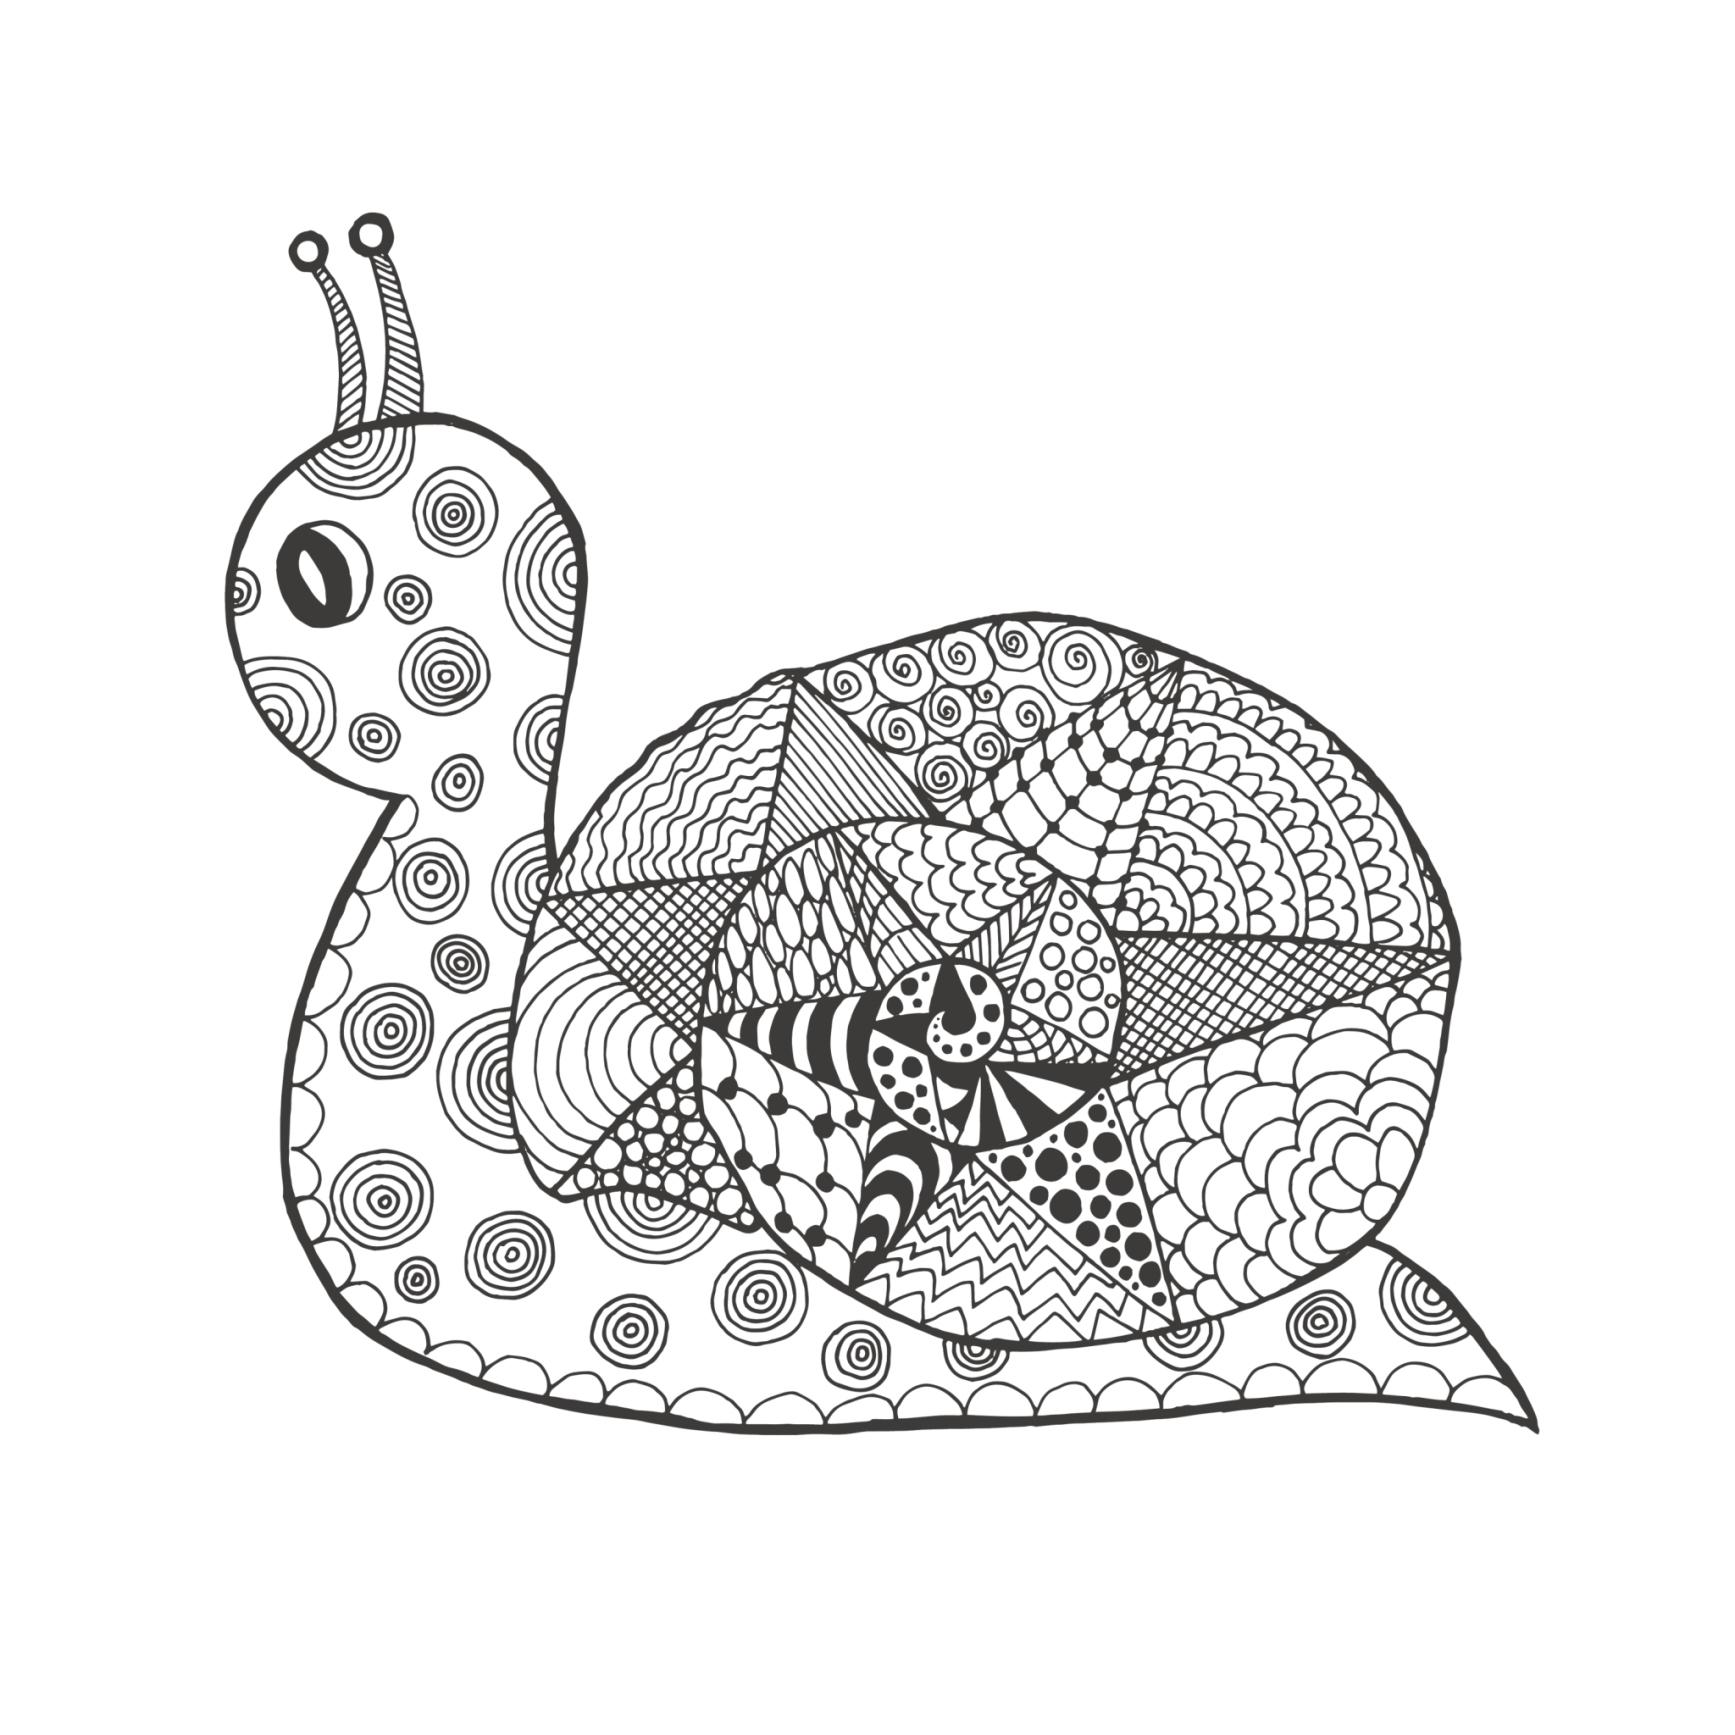 Mándalas Para Colorear Dibujos Mandalas Para Imprimir